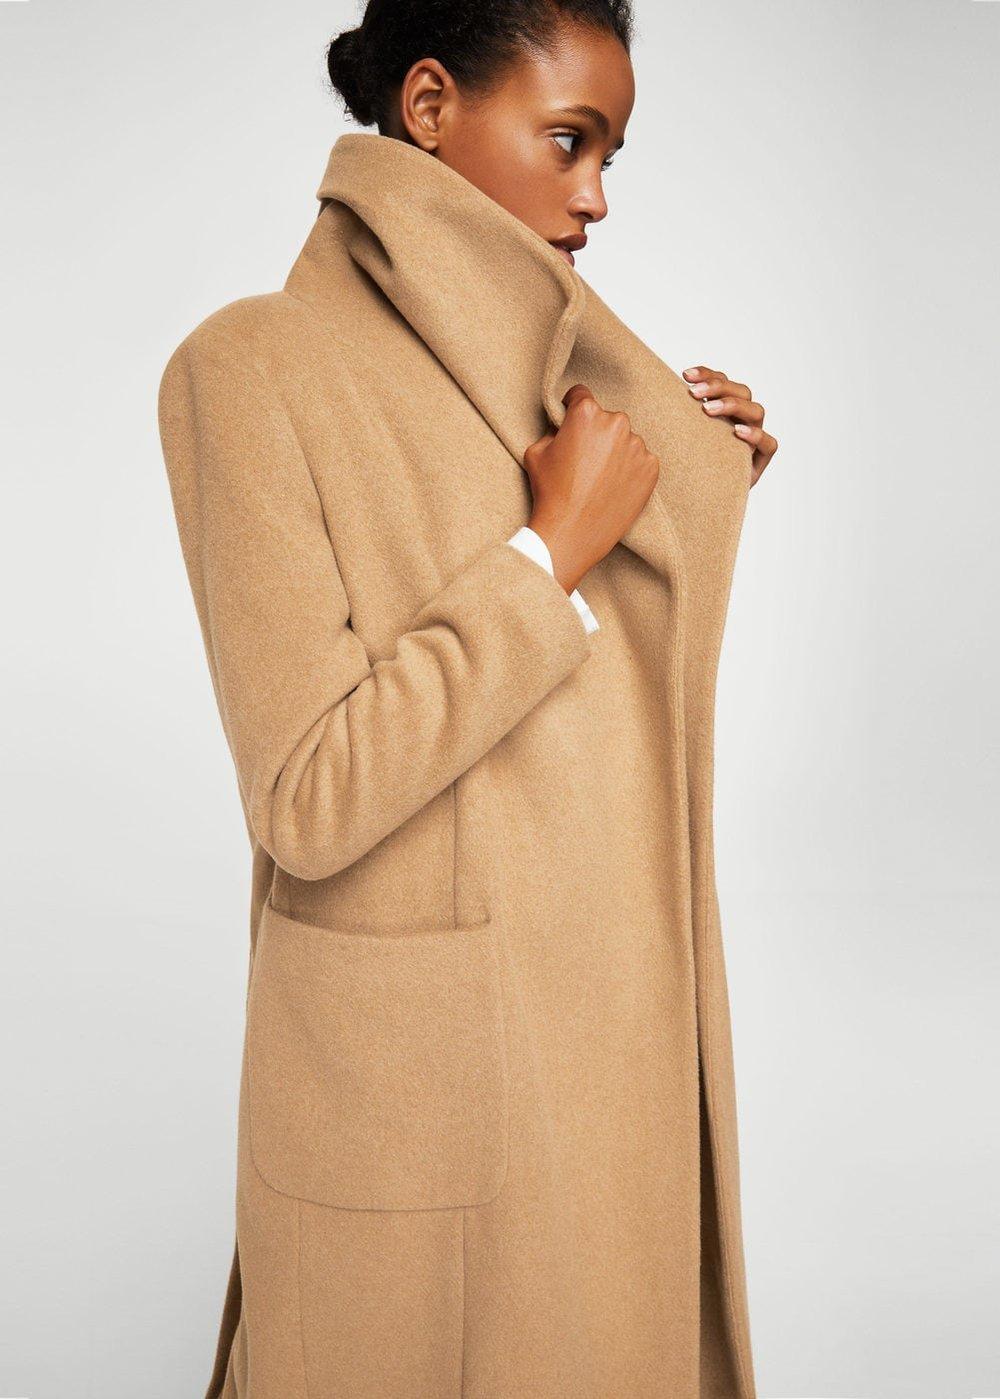 Mango Tan Belted Coat.jpg